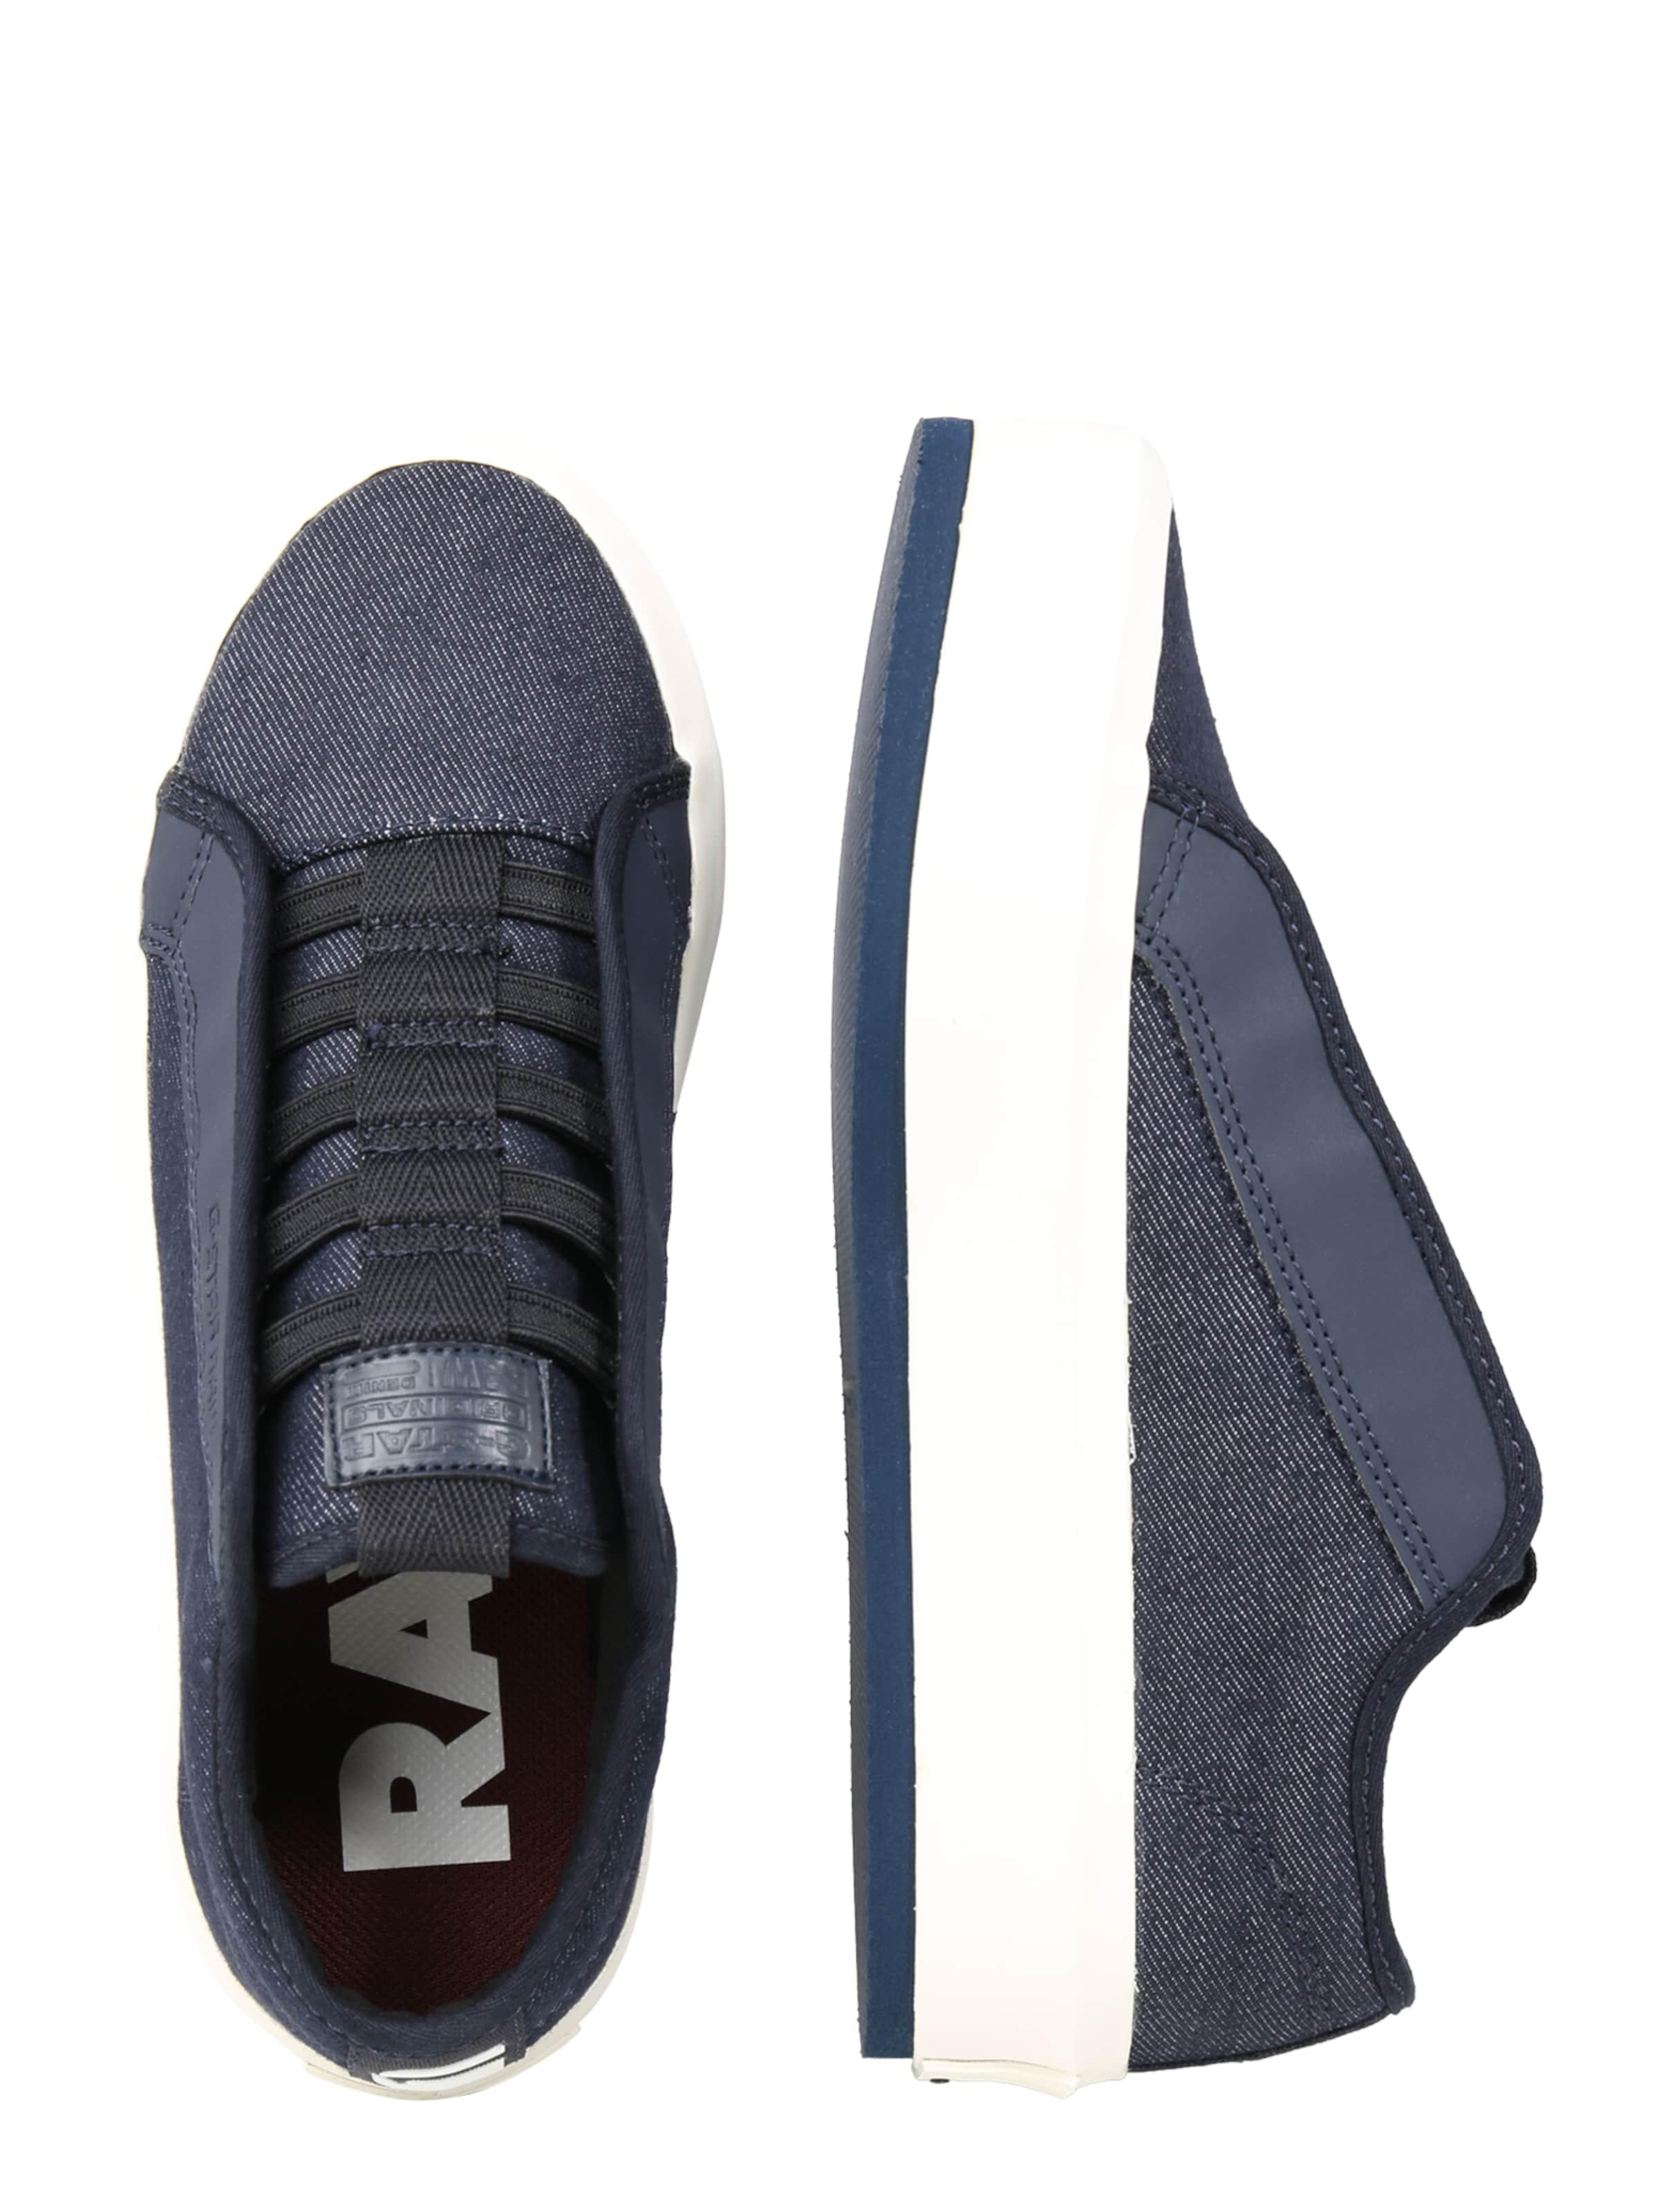 G Up' Denim Lace Sneaker 'strett In star Raw Dunkelblau lJFKT1c